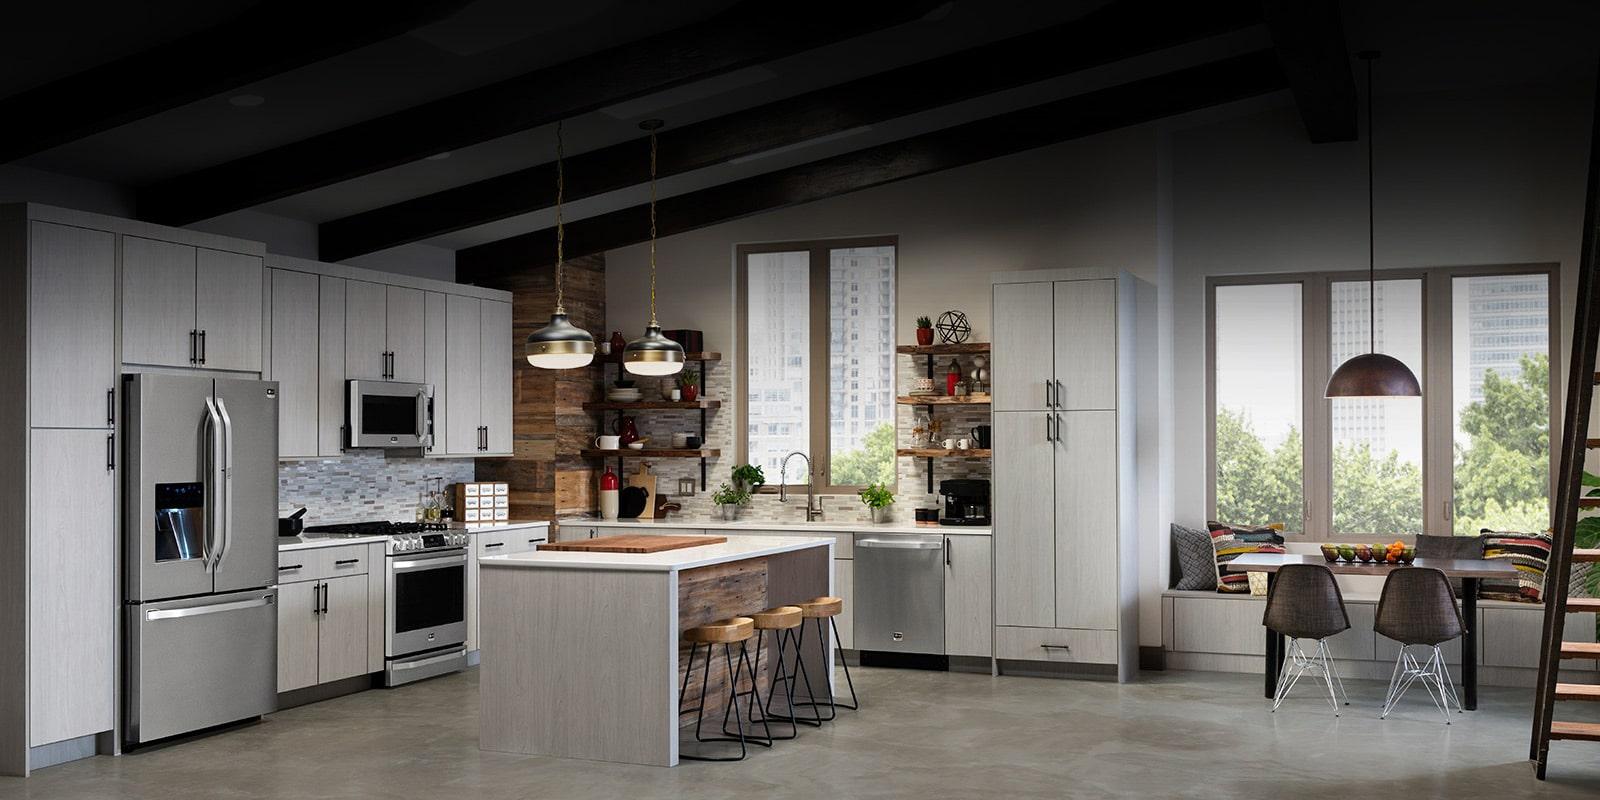 Uncategorized Lg Kitchen Appliances lg appliances discover home and kitchen malaysia appliances